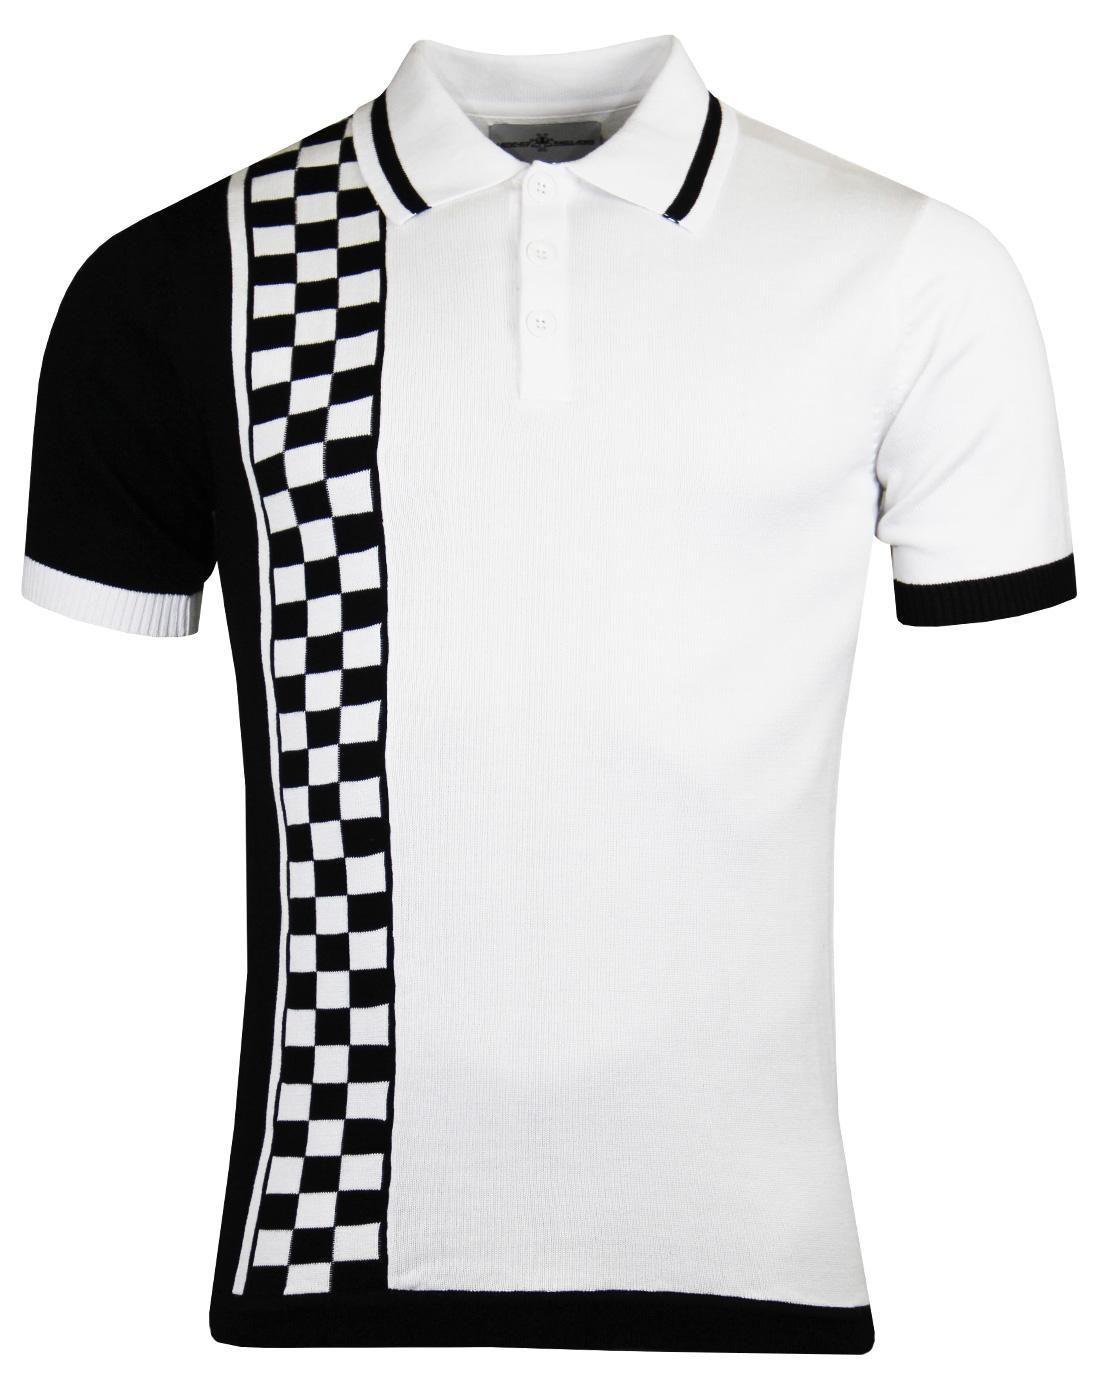 35a47641f Maytal MADCAP ENGLAND Mod Ska Check Stripe Polo